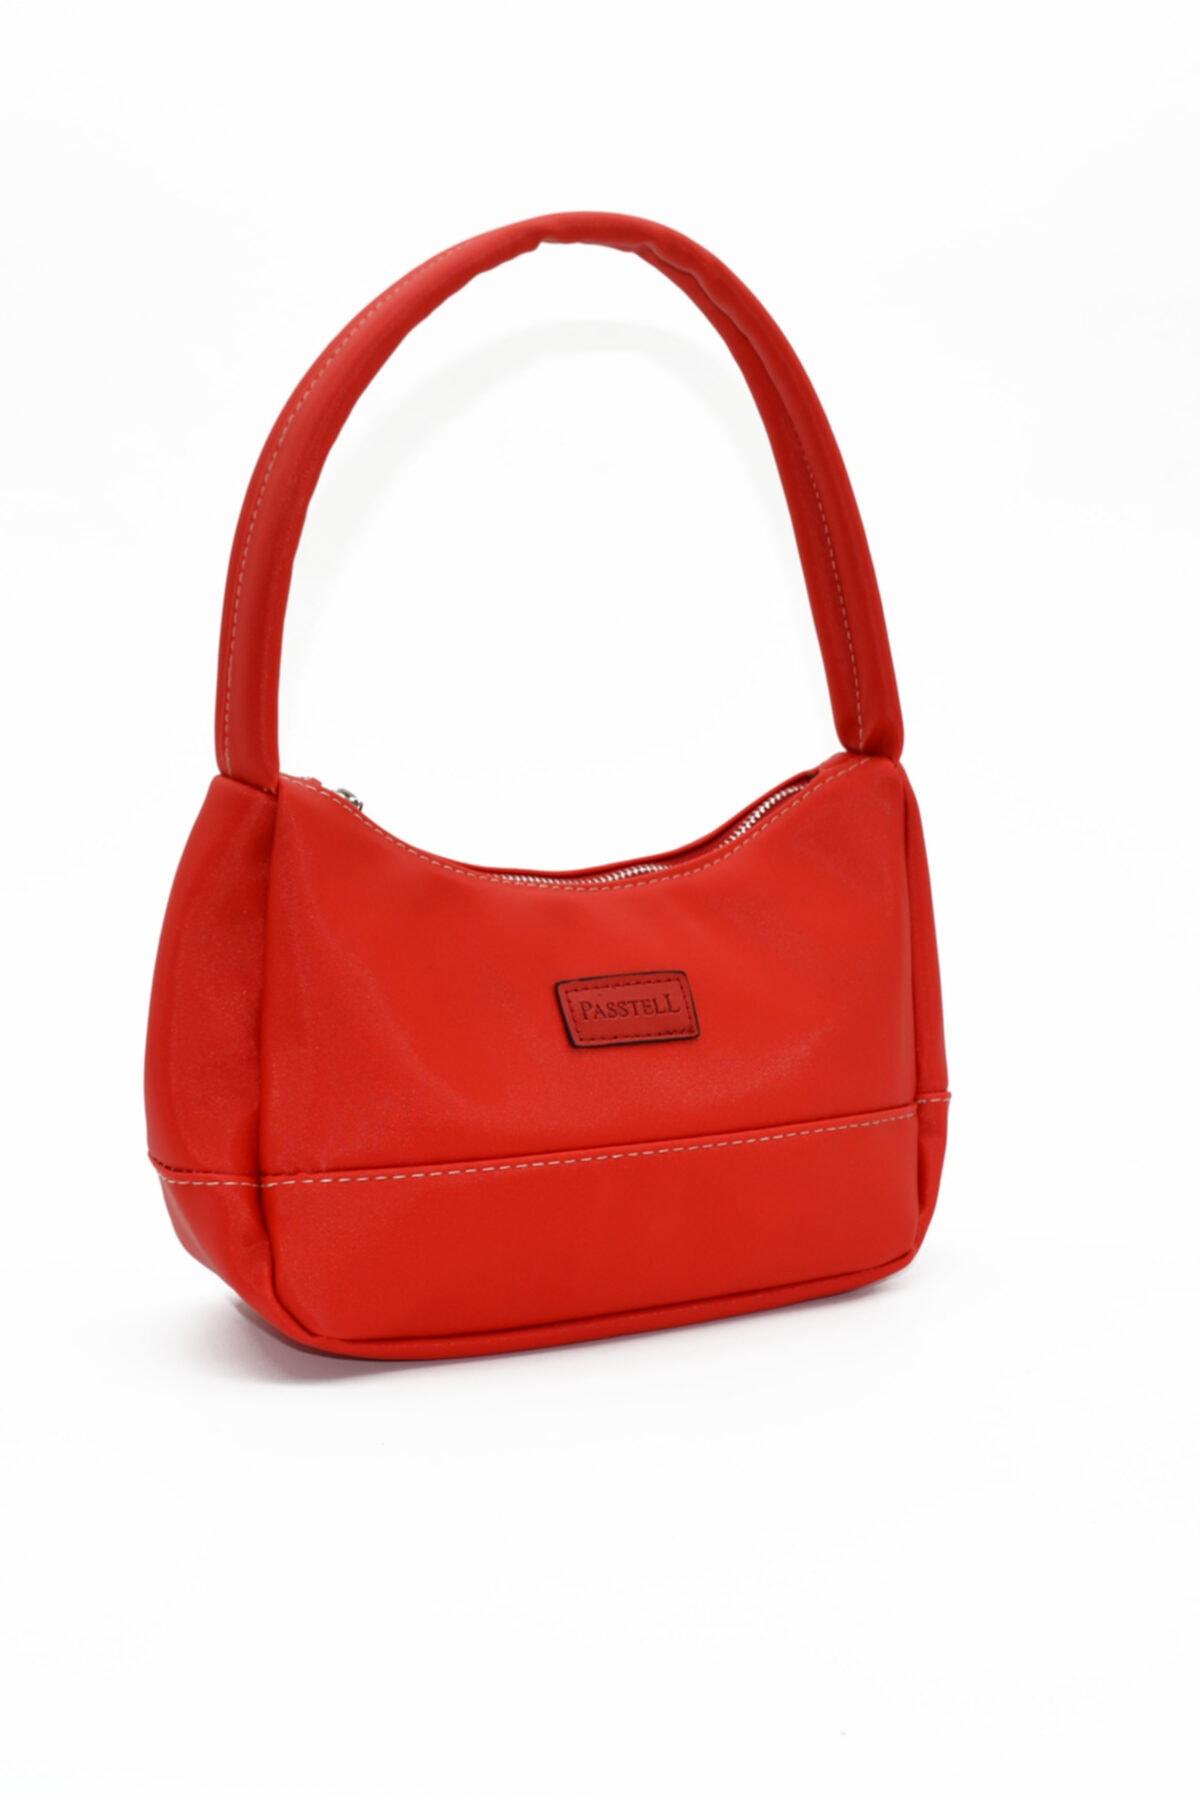 PASSTELL Bayan  Kırmızı  Saten Baget Çanta 2